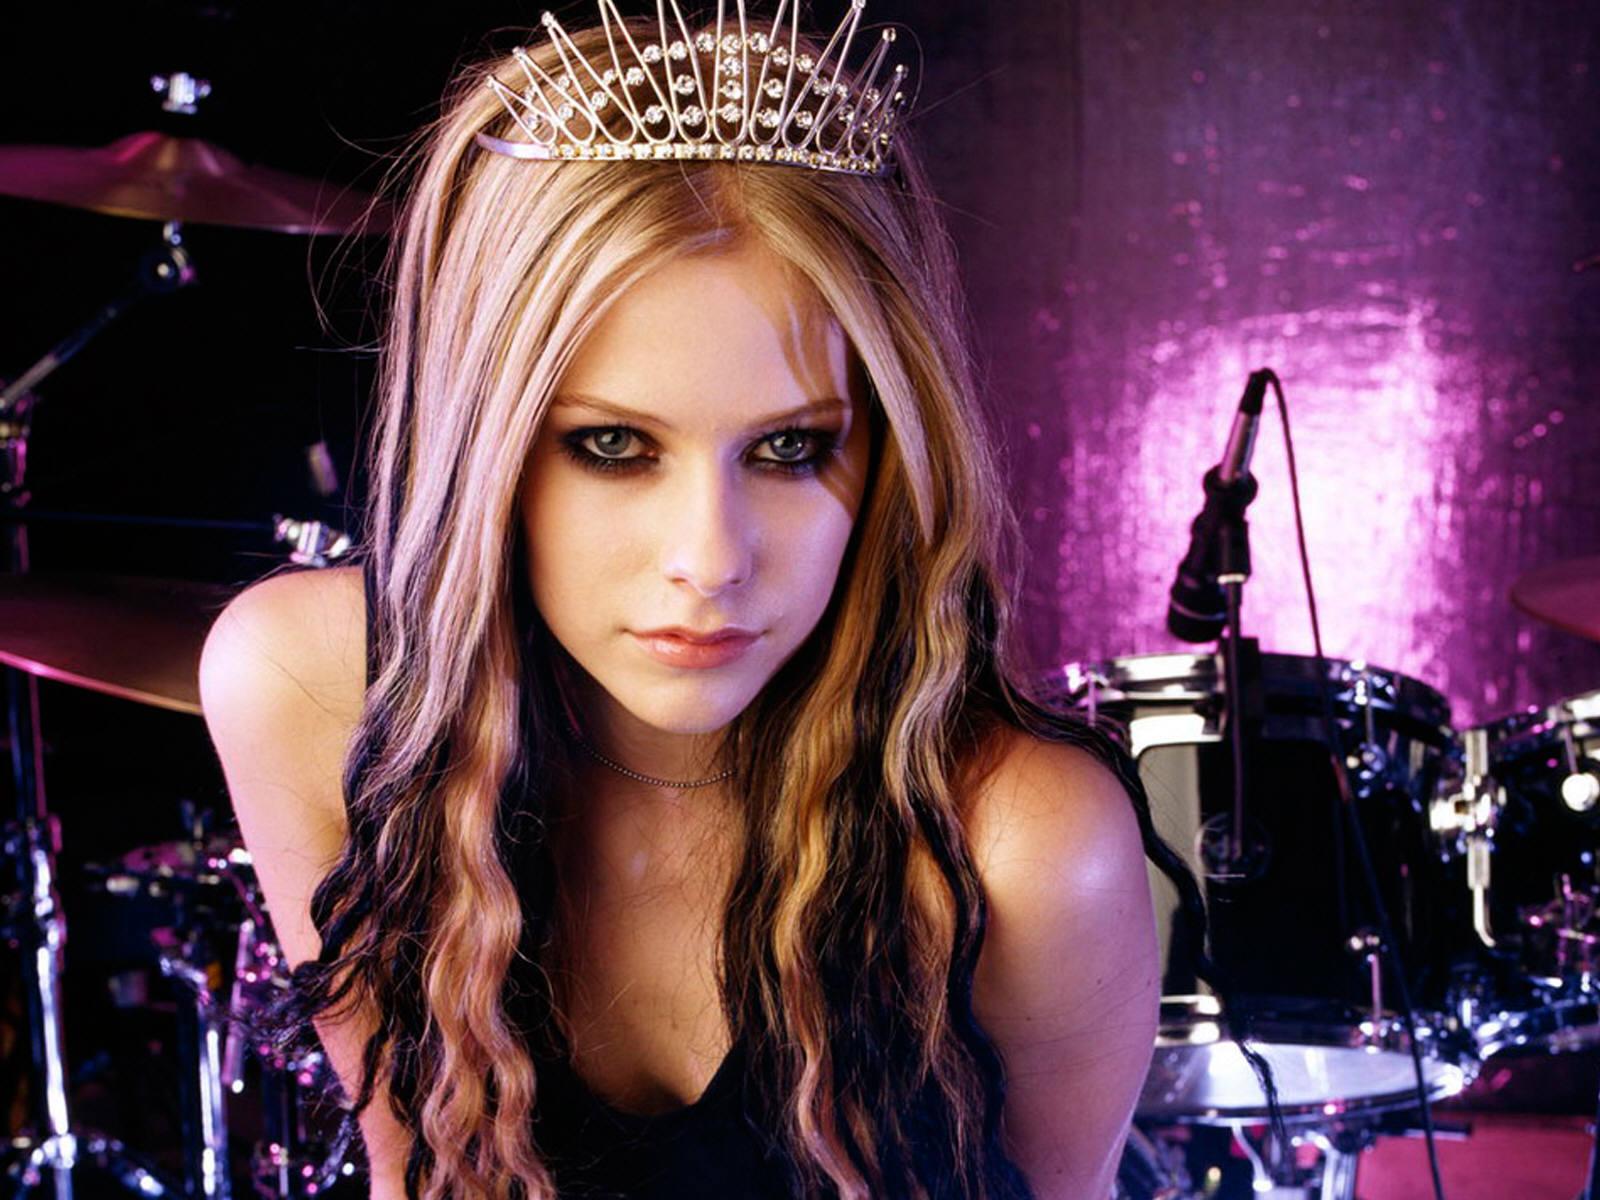 Avril Lavigne Modern Hairstyle